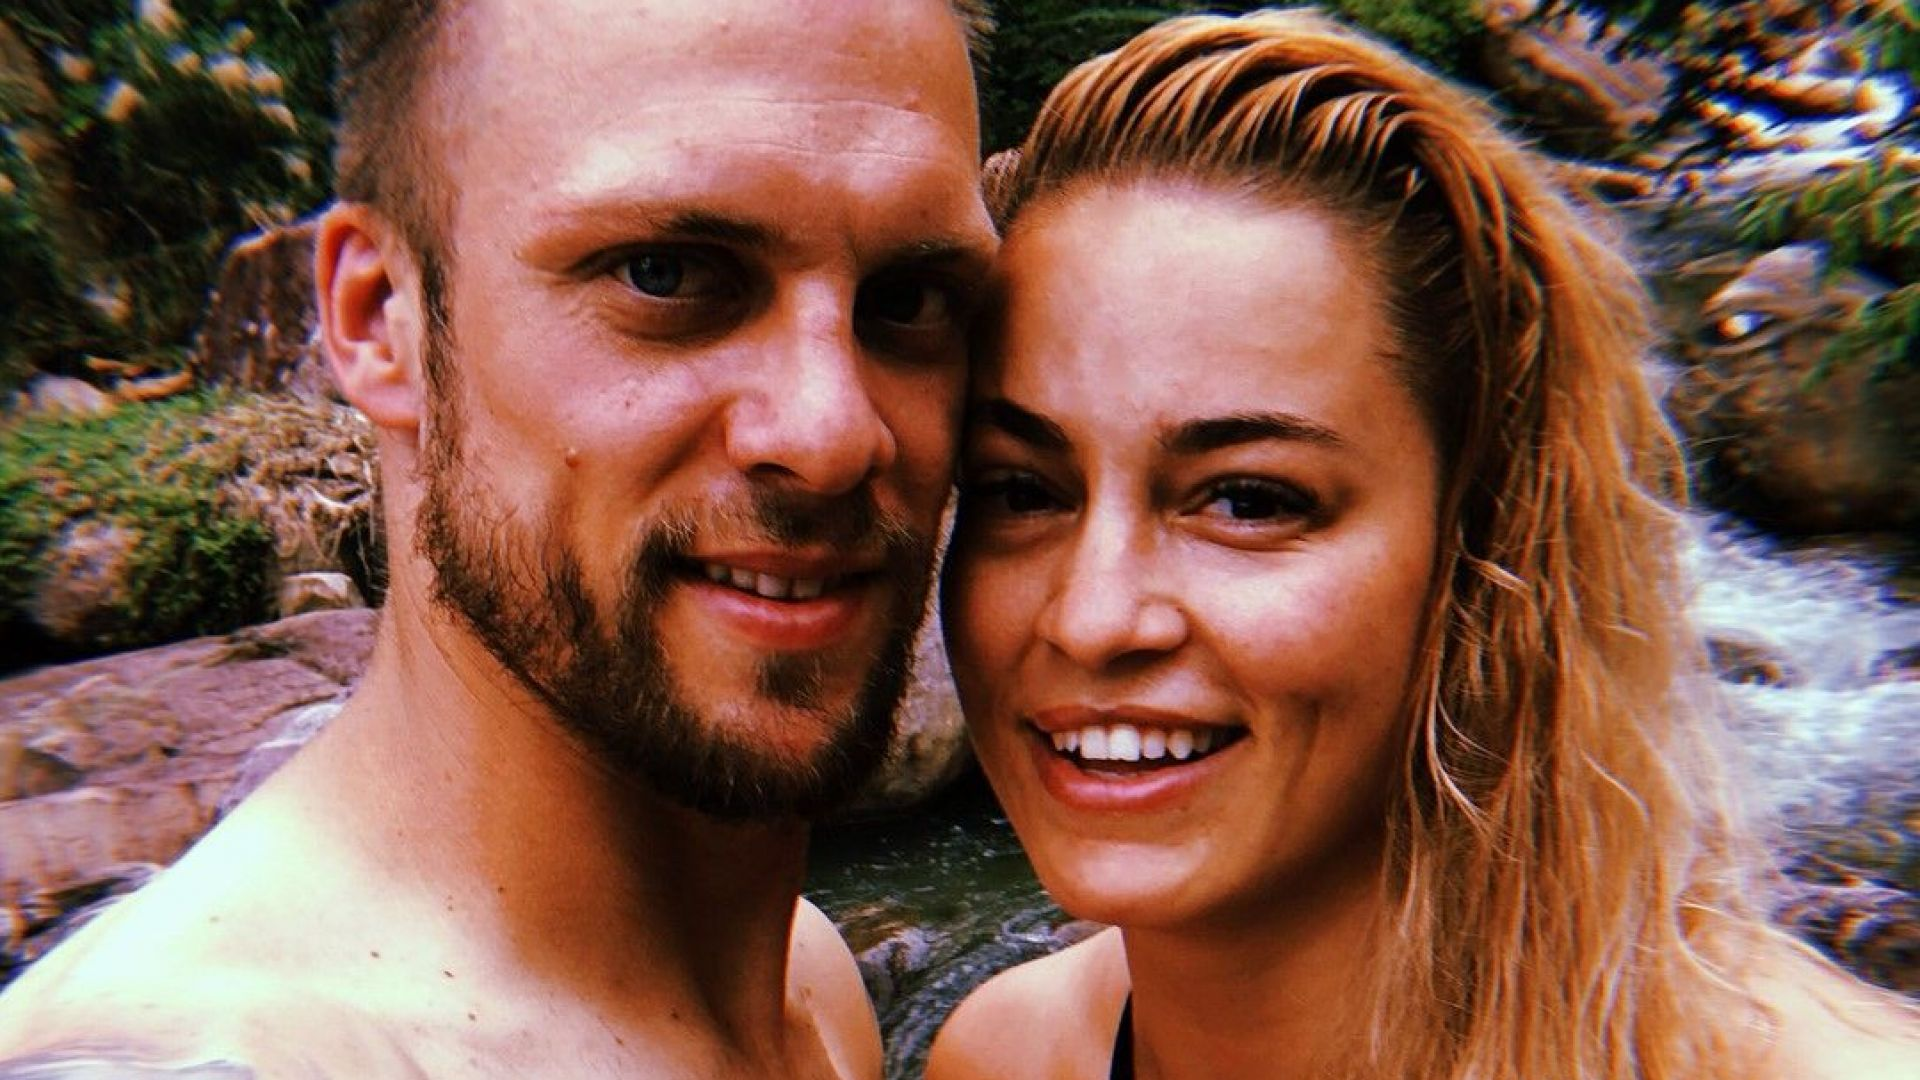 Евгения и Ваня Джаферович в Камбоджа, където той спечели Survivor